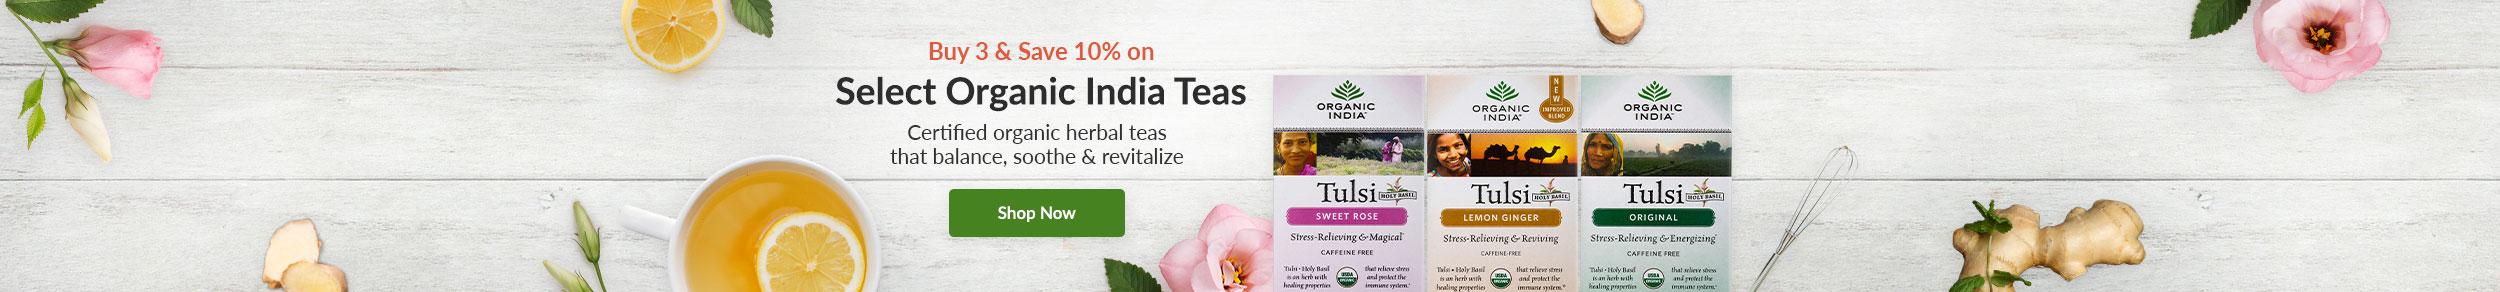 https://i3.pureformulas.net/images/static/Organic-India-Teas_Food-Slide-1_120618.jpg